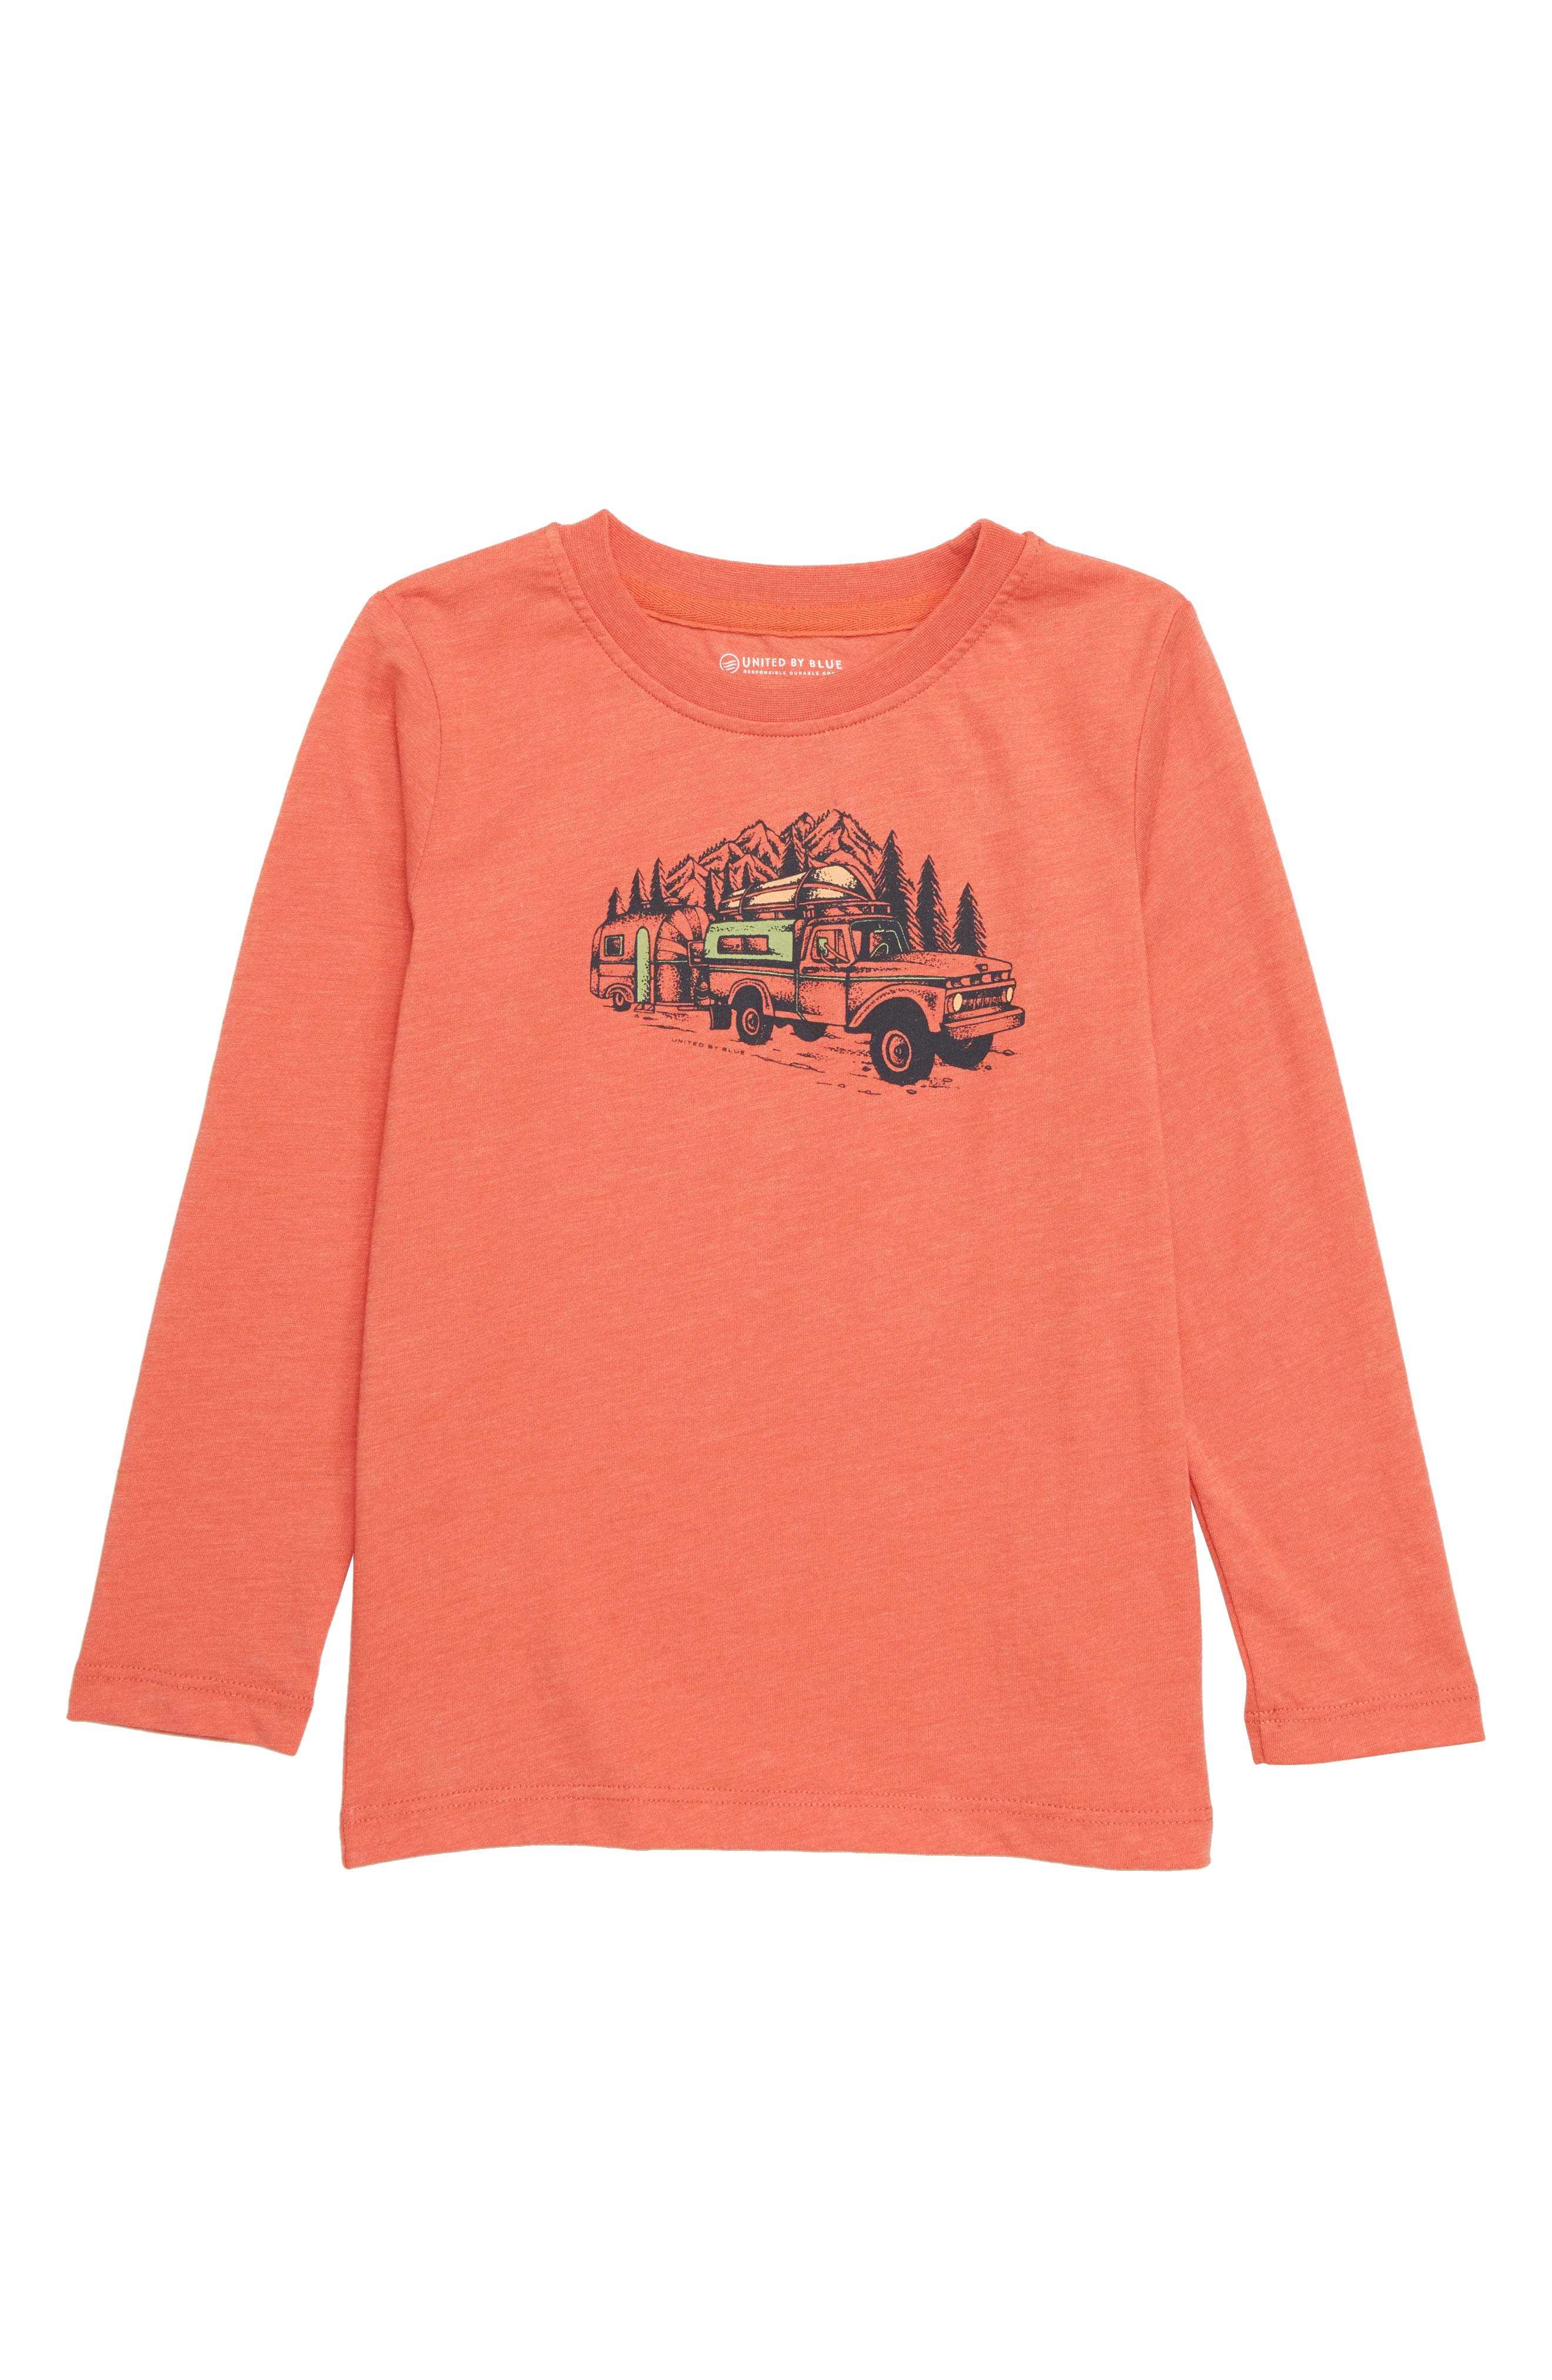 Truck 'n' Camper T-Shirt,                             Main thumbnail 1, color,                             800